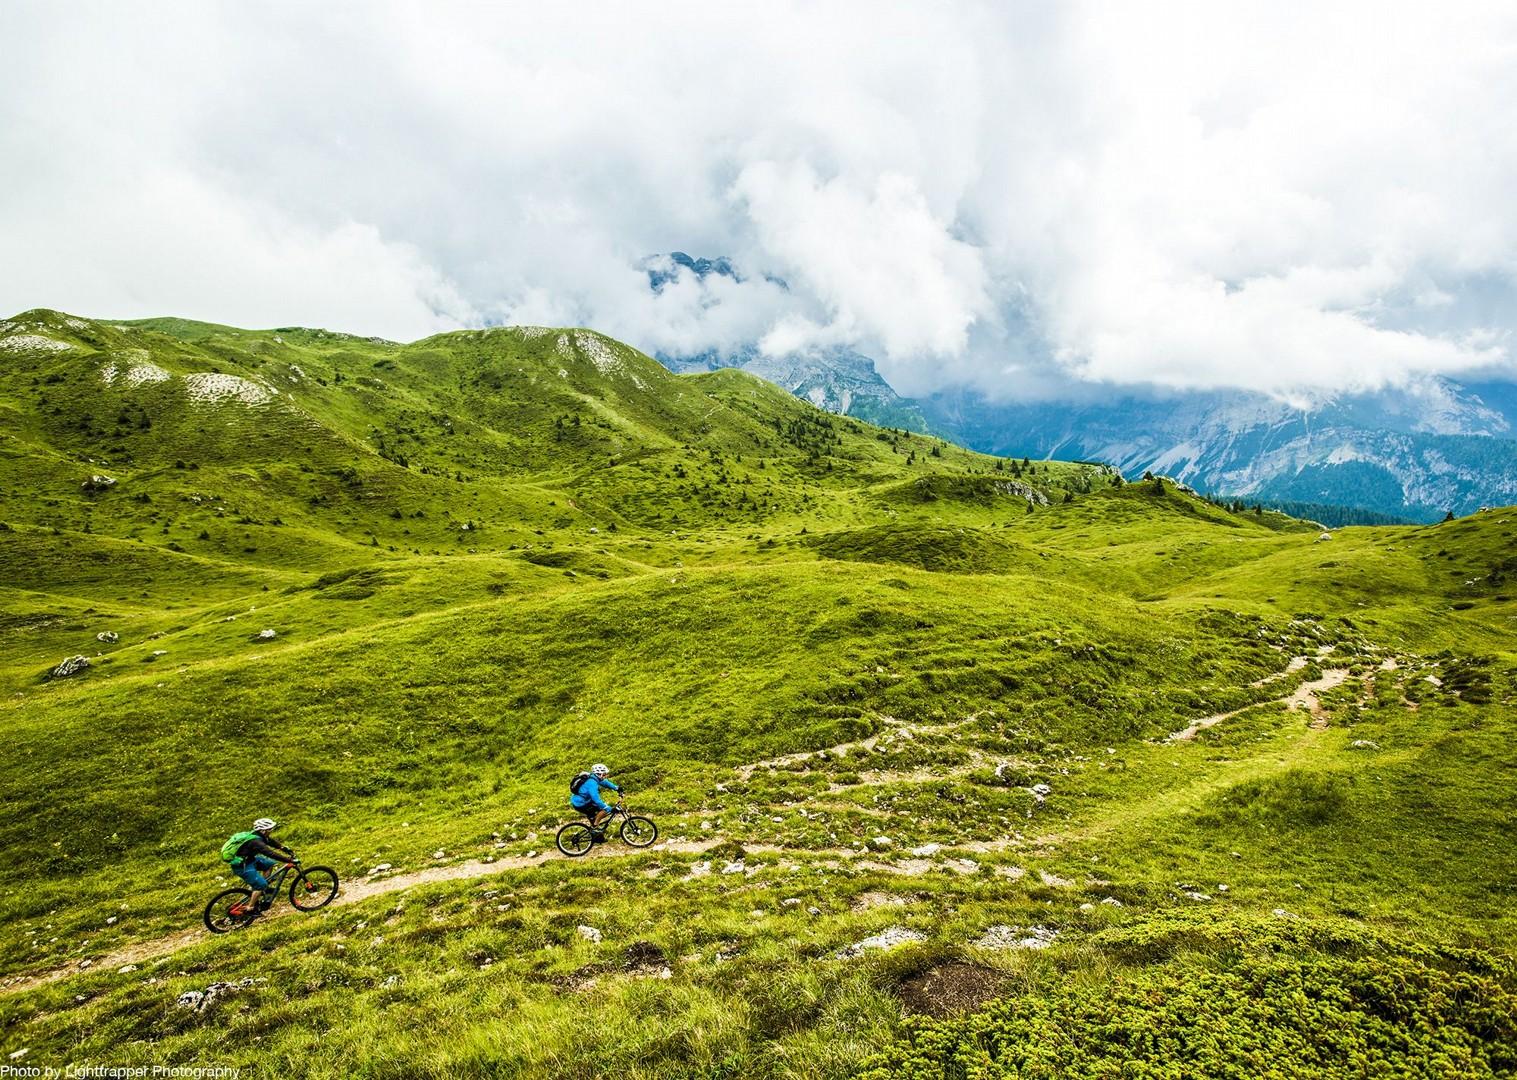 saddle_skedaddle_italy_2017_day6_brenta_dolomites_177-2.jpg - Italy - Dolomites of Brenta - Guided Mountain Bike Holiday - Mountain Biking